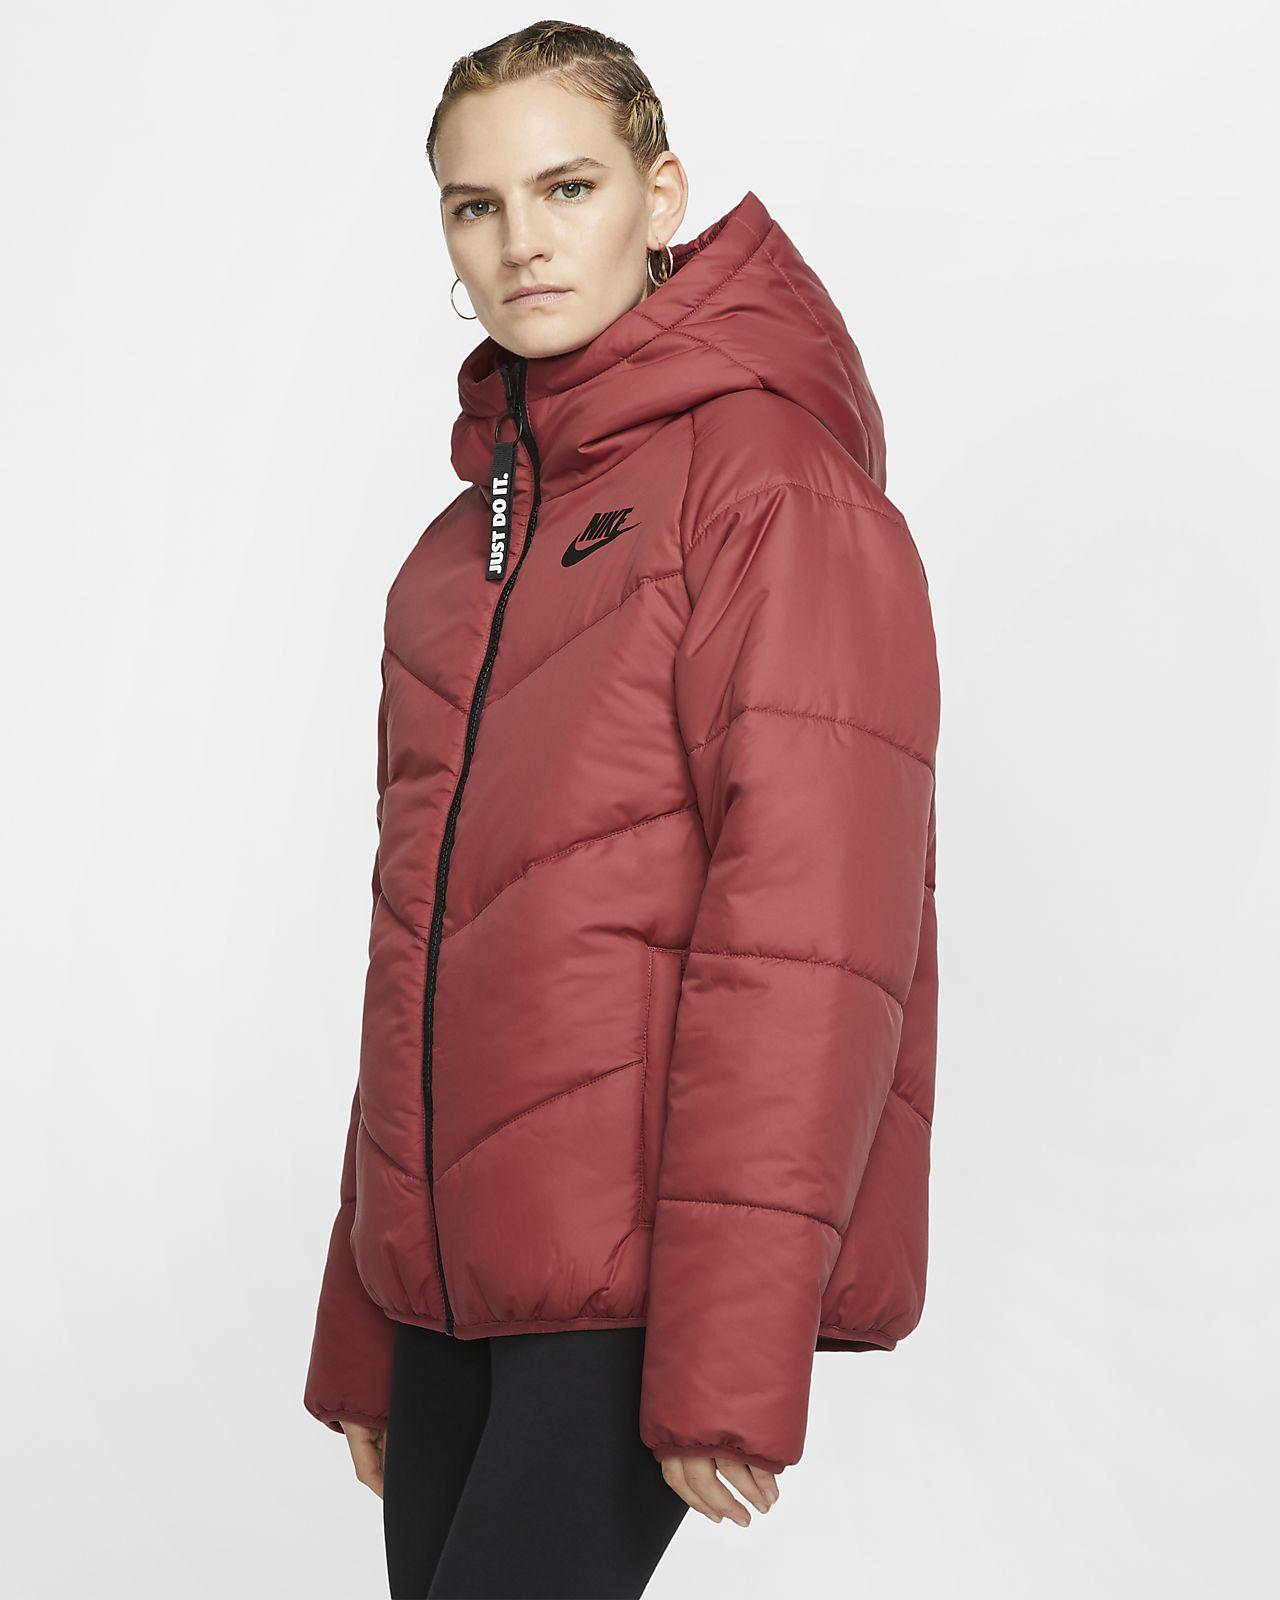 Veste à capuche Nike Sportswear Windrunner pour Femme